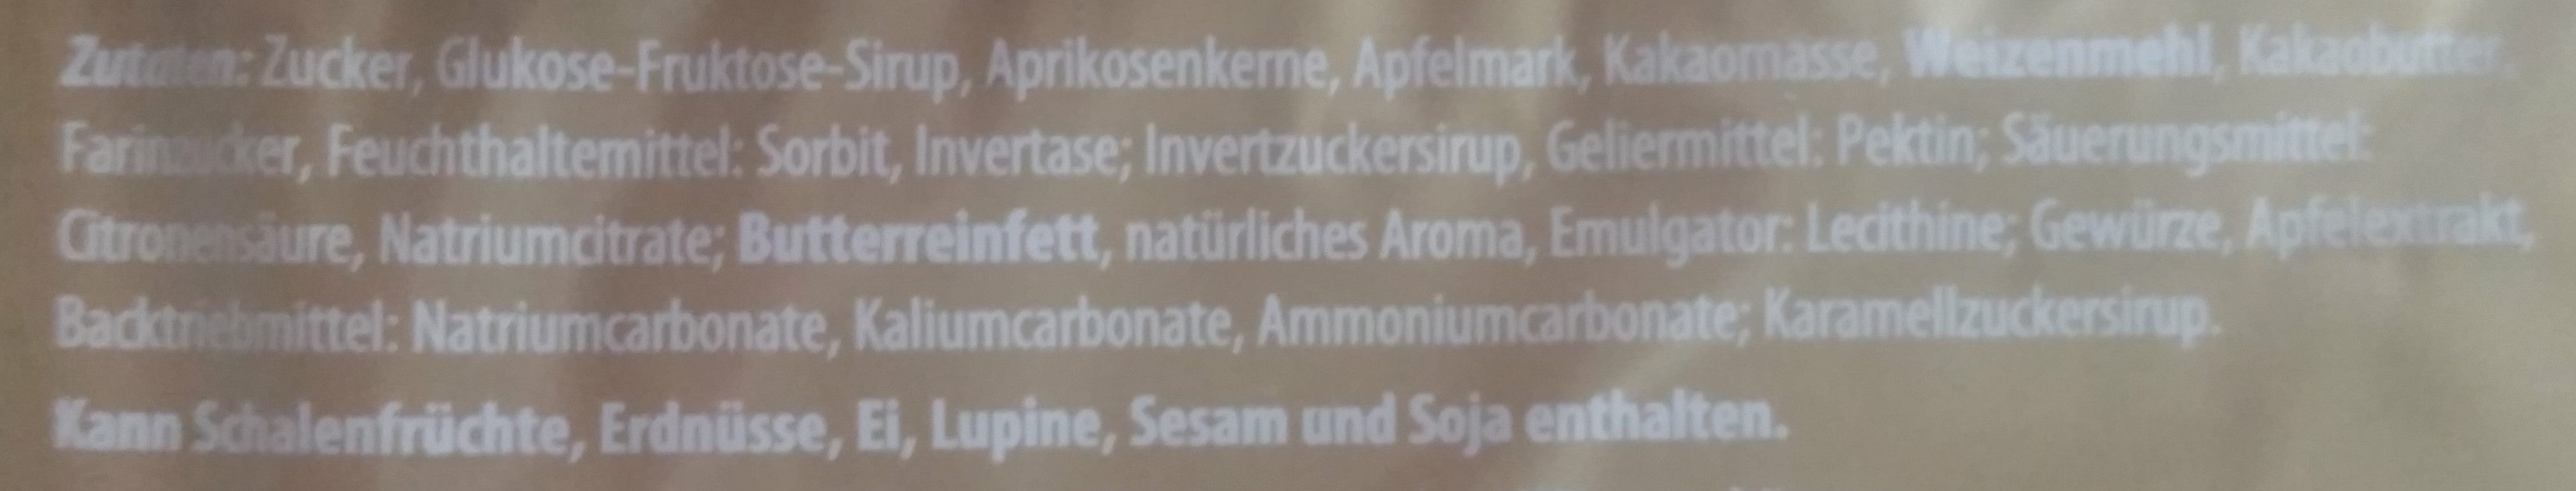 ReichsGraf pan de especias - Ingredients